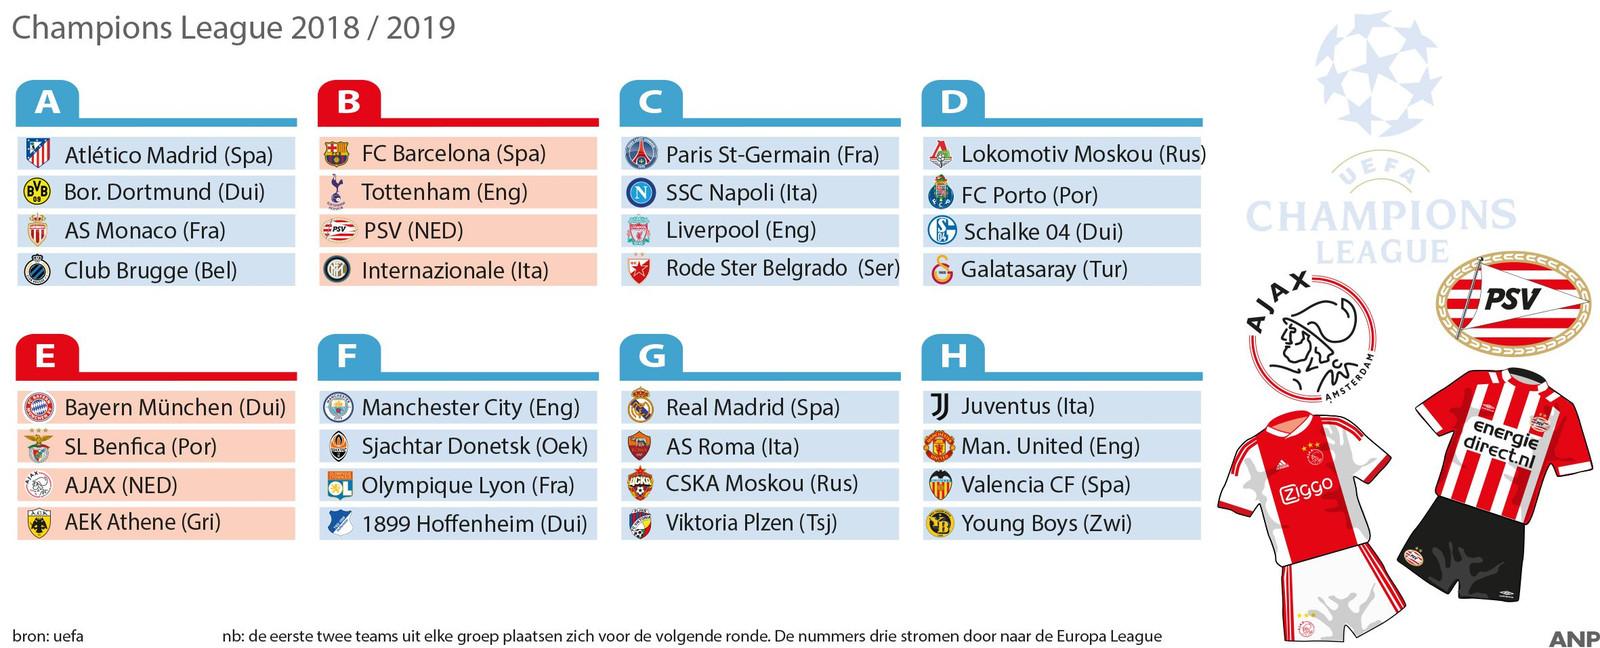 Champions League 2018 / 2019: speelschema Ajax en PSV